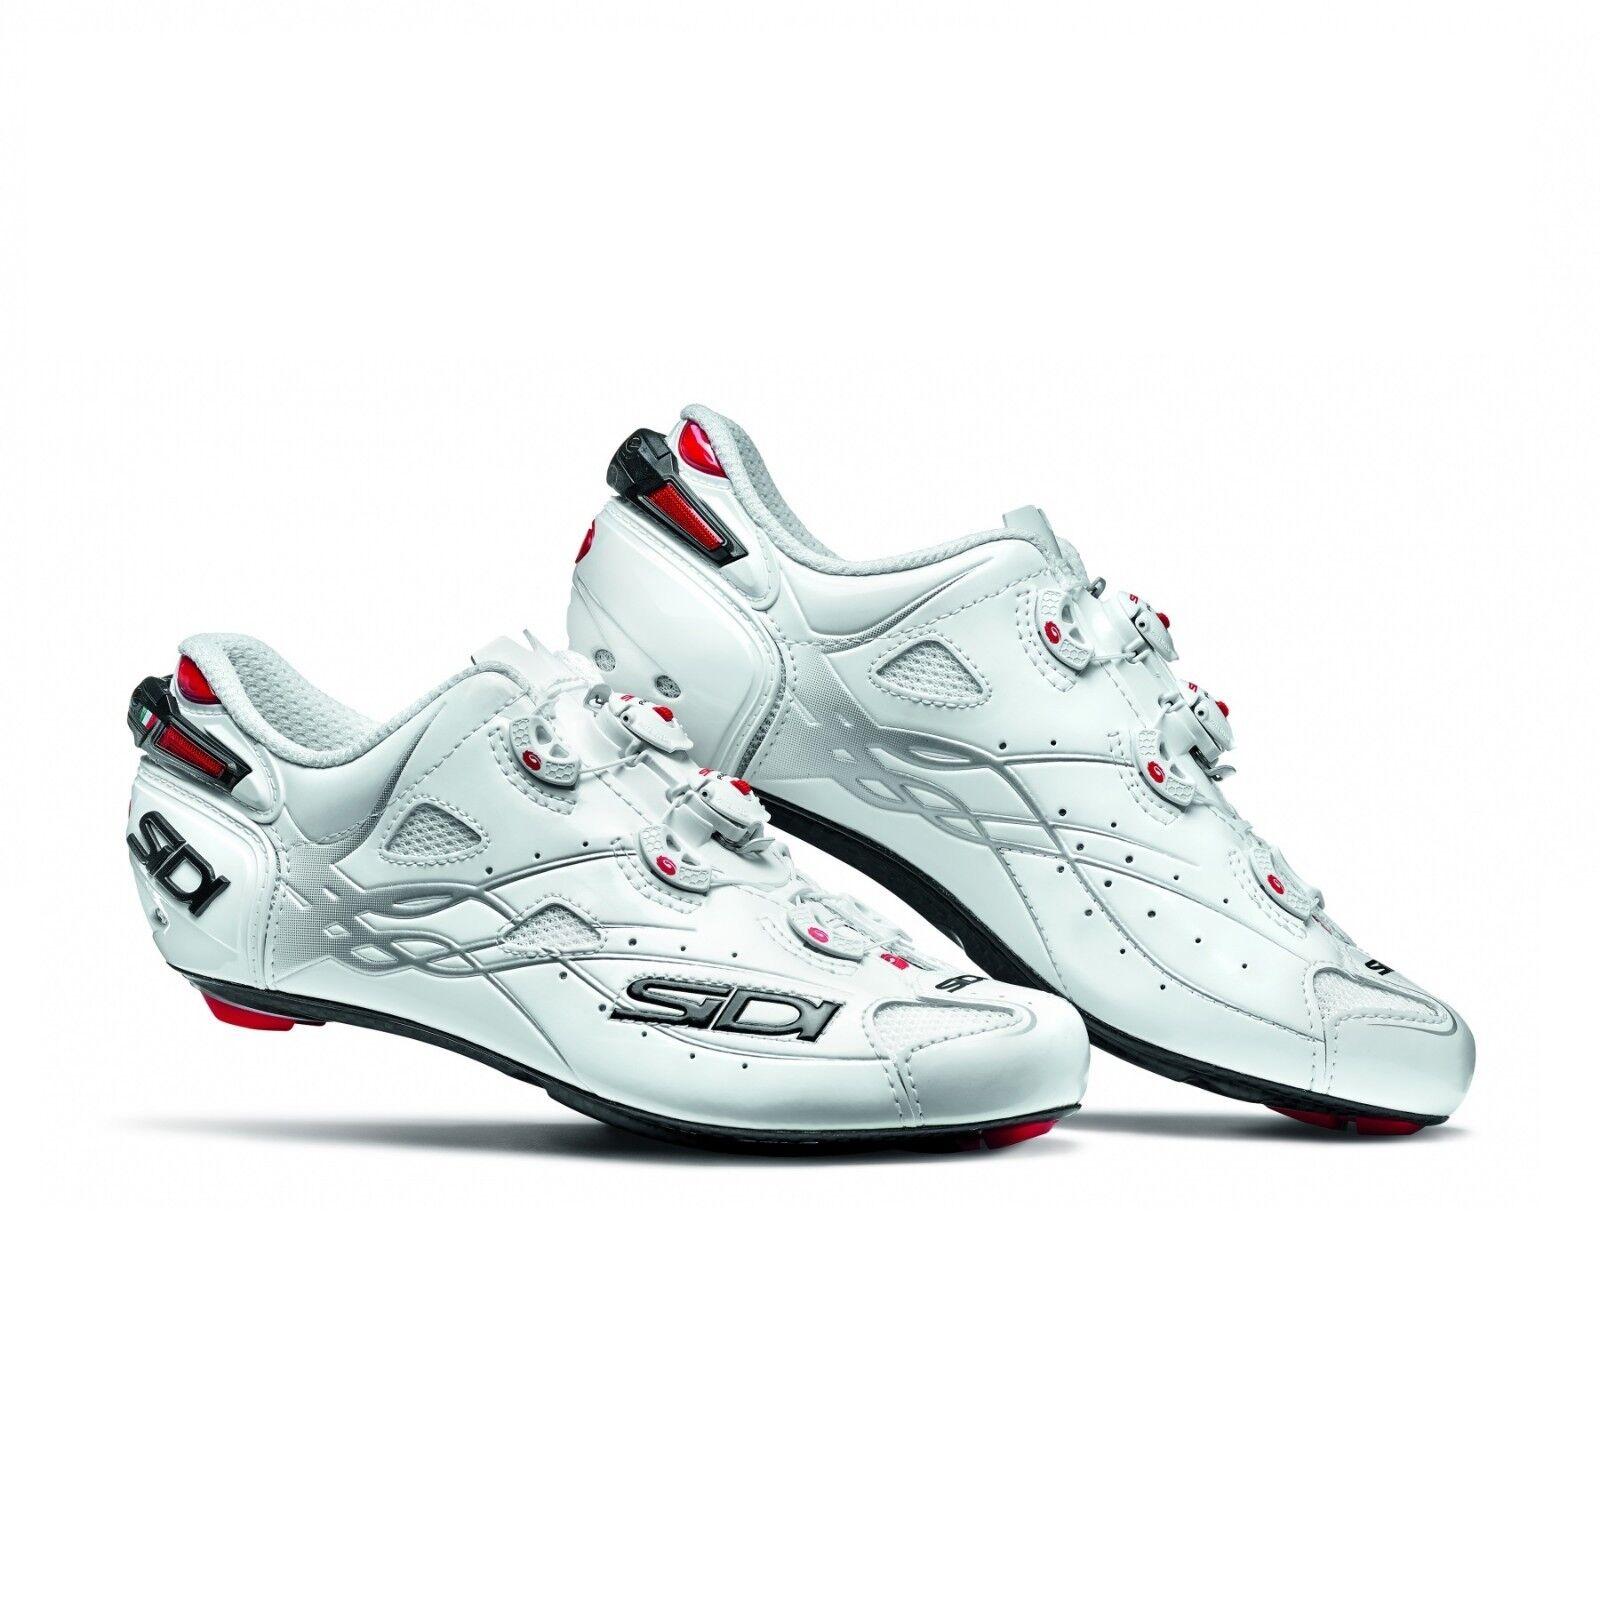 SIDI Shot Road Carbon Cycling shoes Cleat Bike shoes White White 40-46 EUR